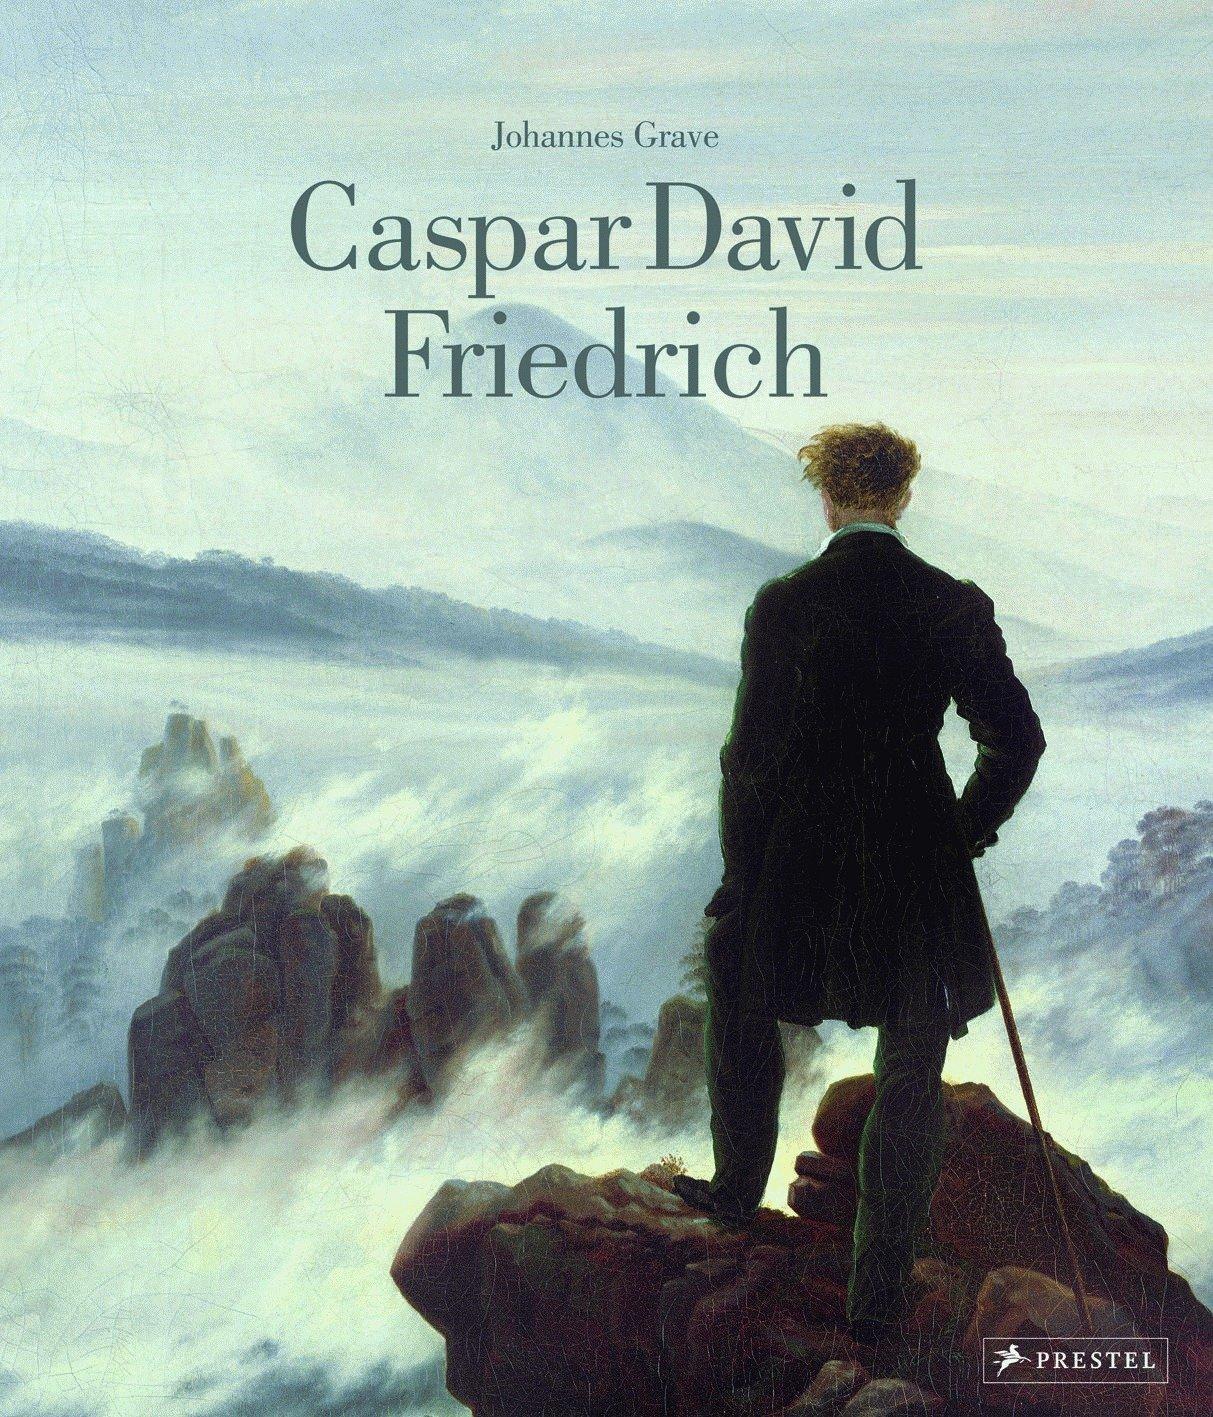 Caspar David Friedrich